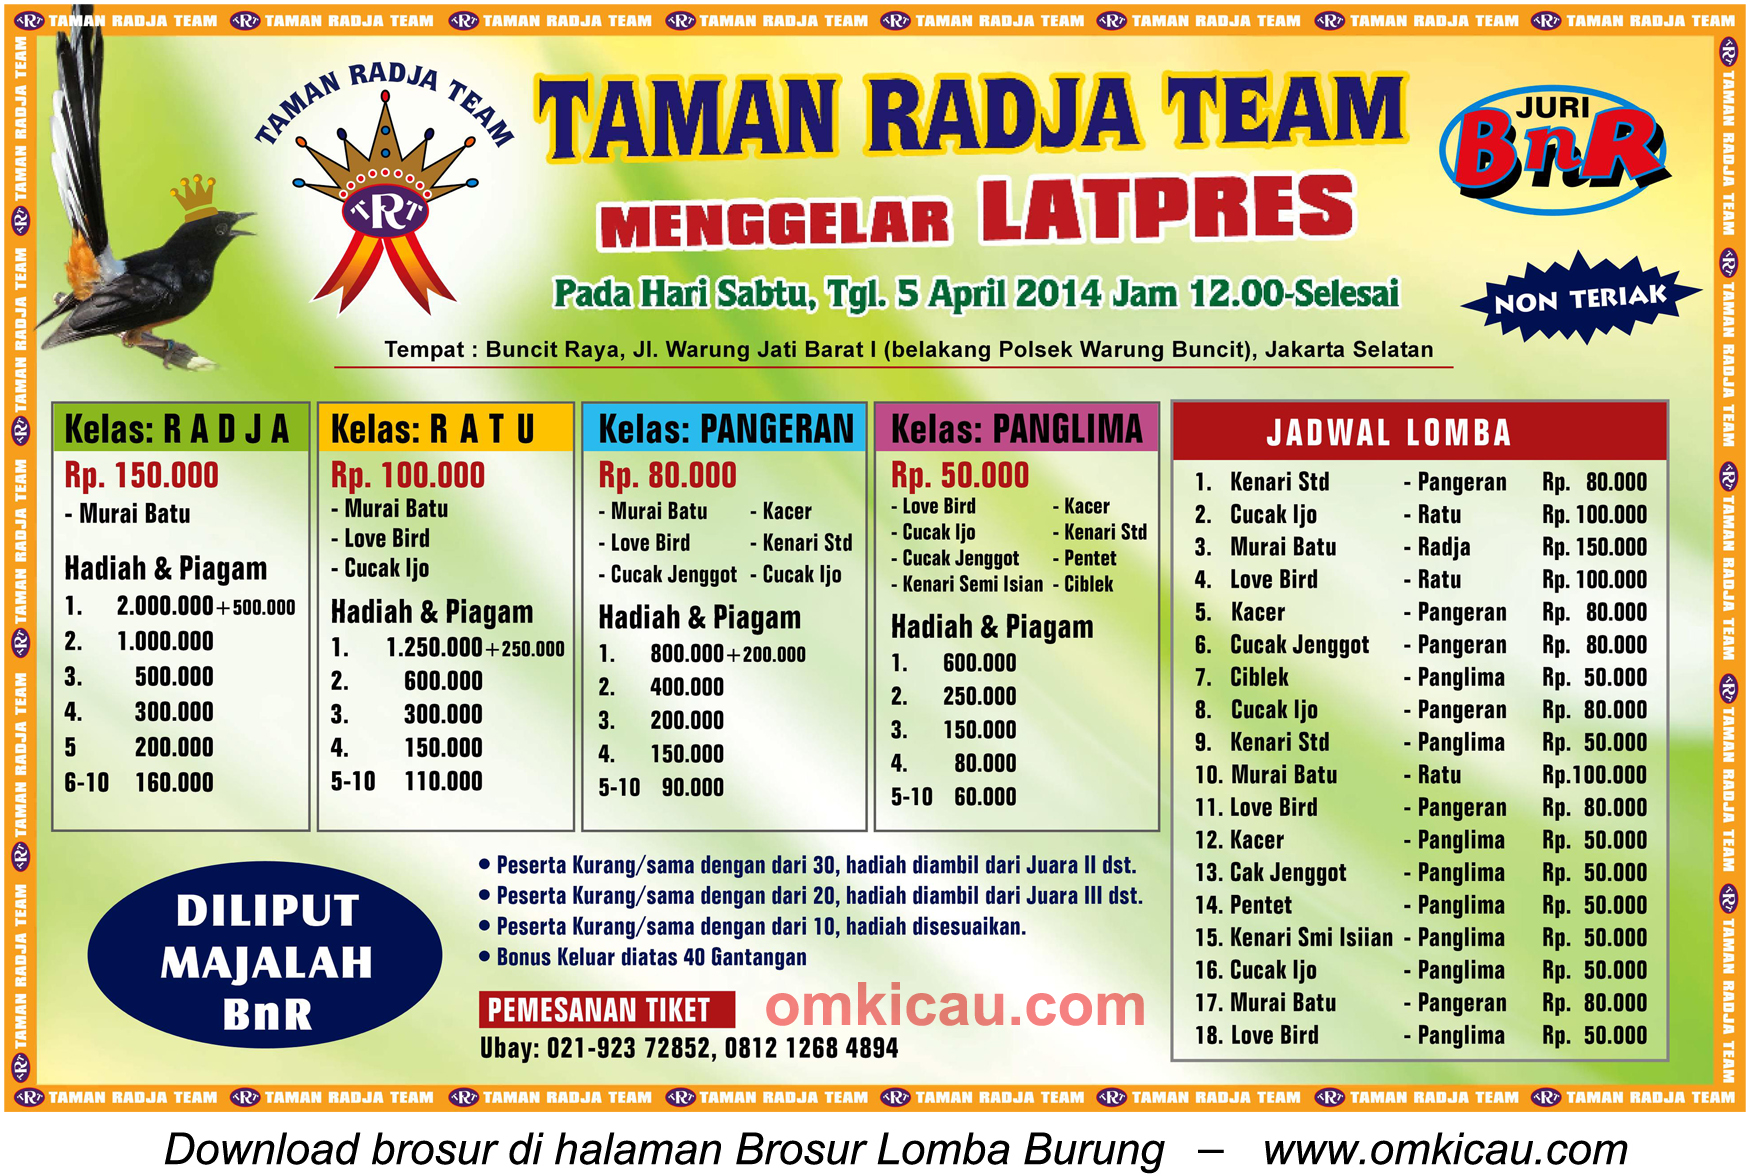 Brosur Latpres Burung Berkicau Taman Radja Team, Jakarta Selatan, 5 April 2014